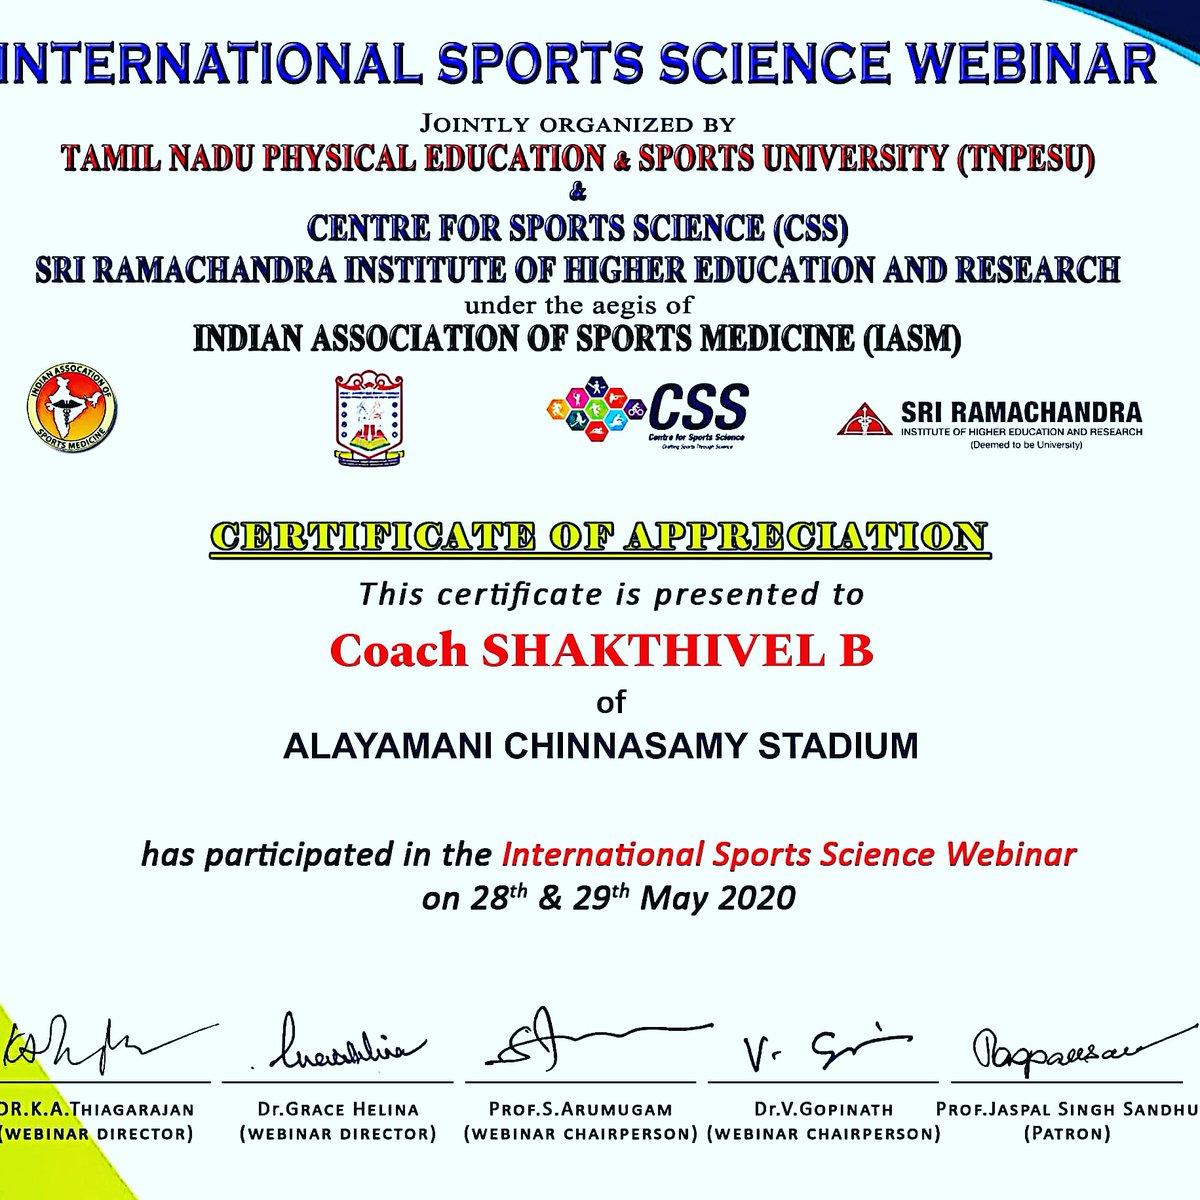 #International Sports Science webinar@ online amazing# pic.twitter.com/GJOraje3GF